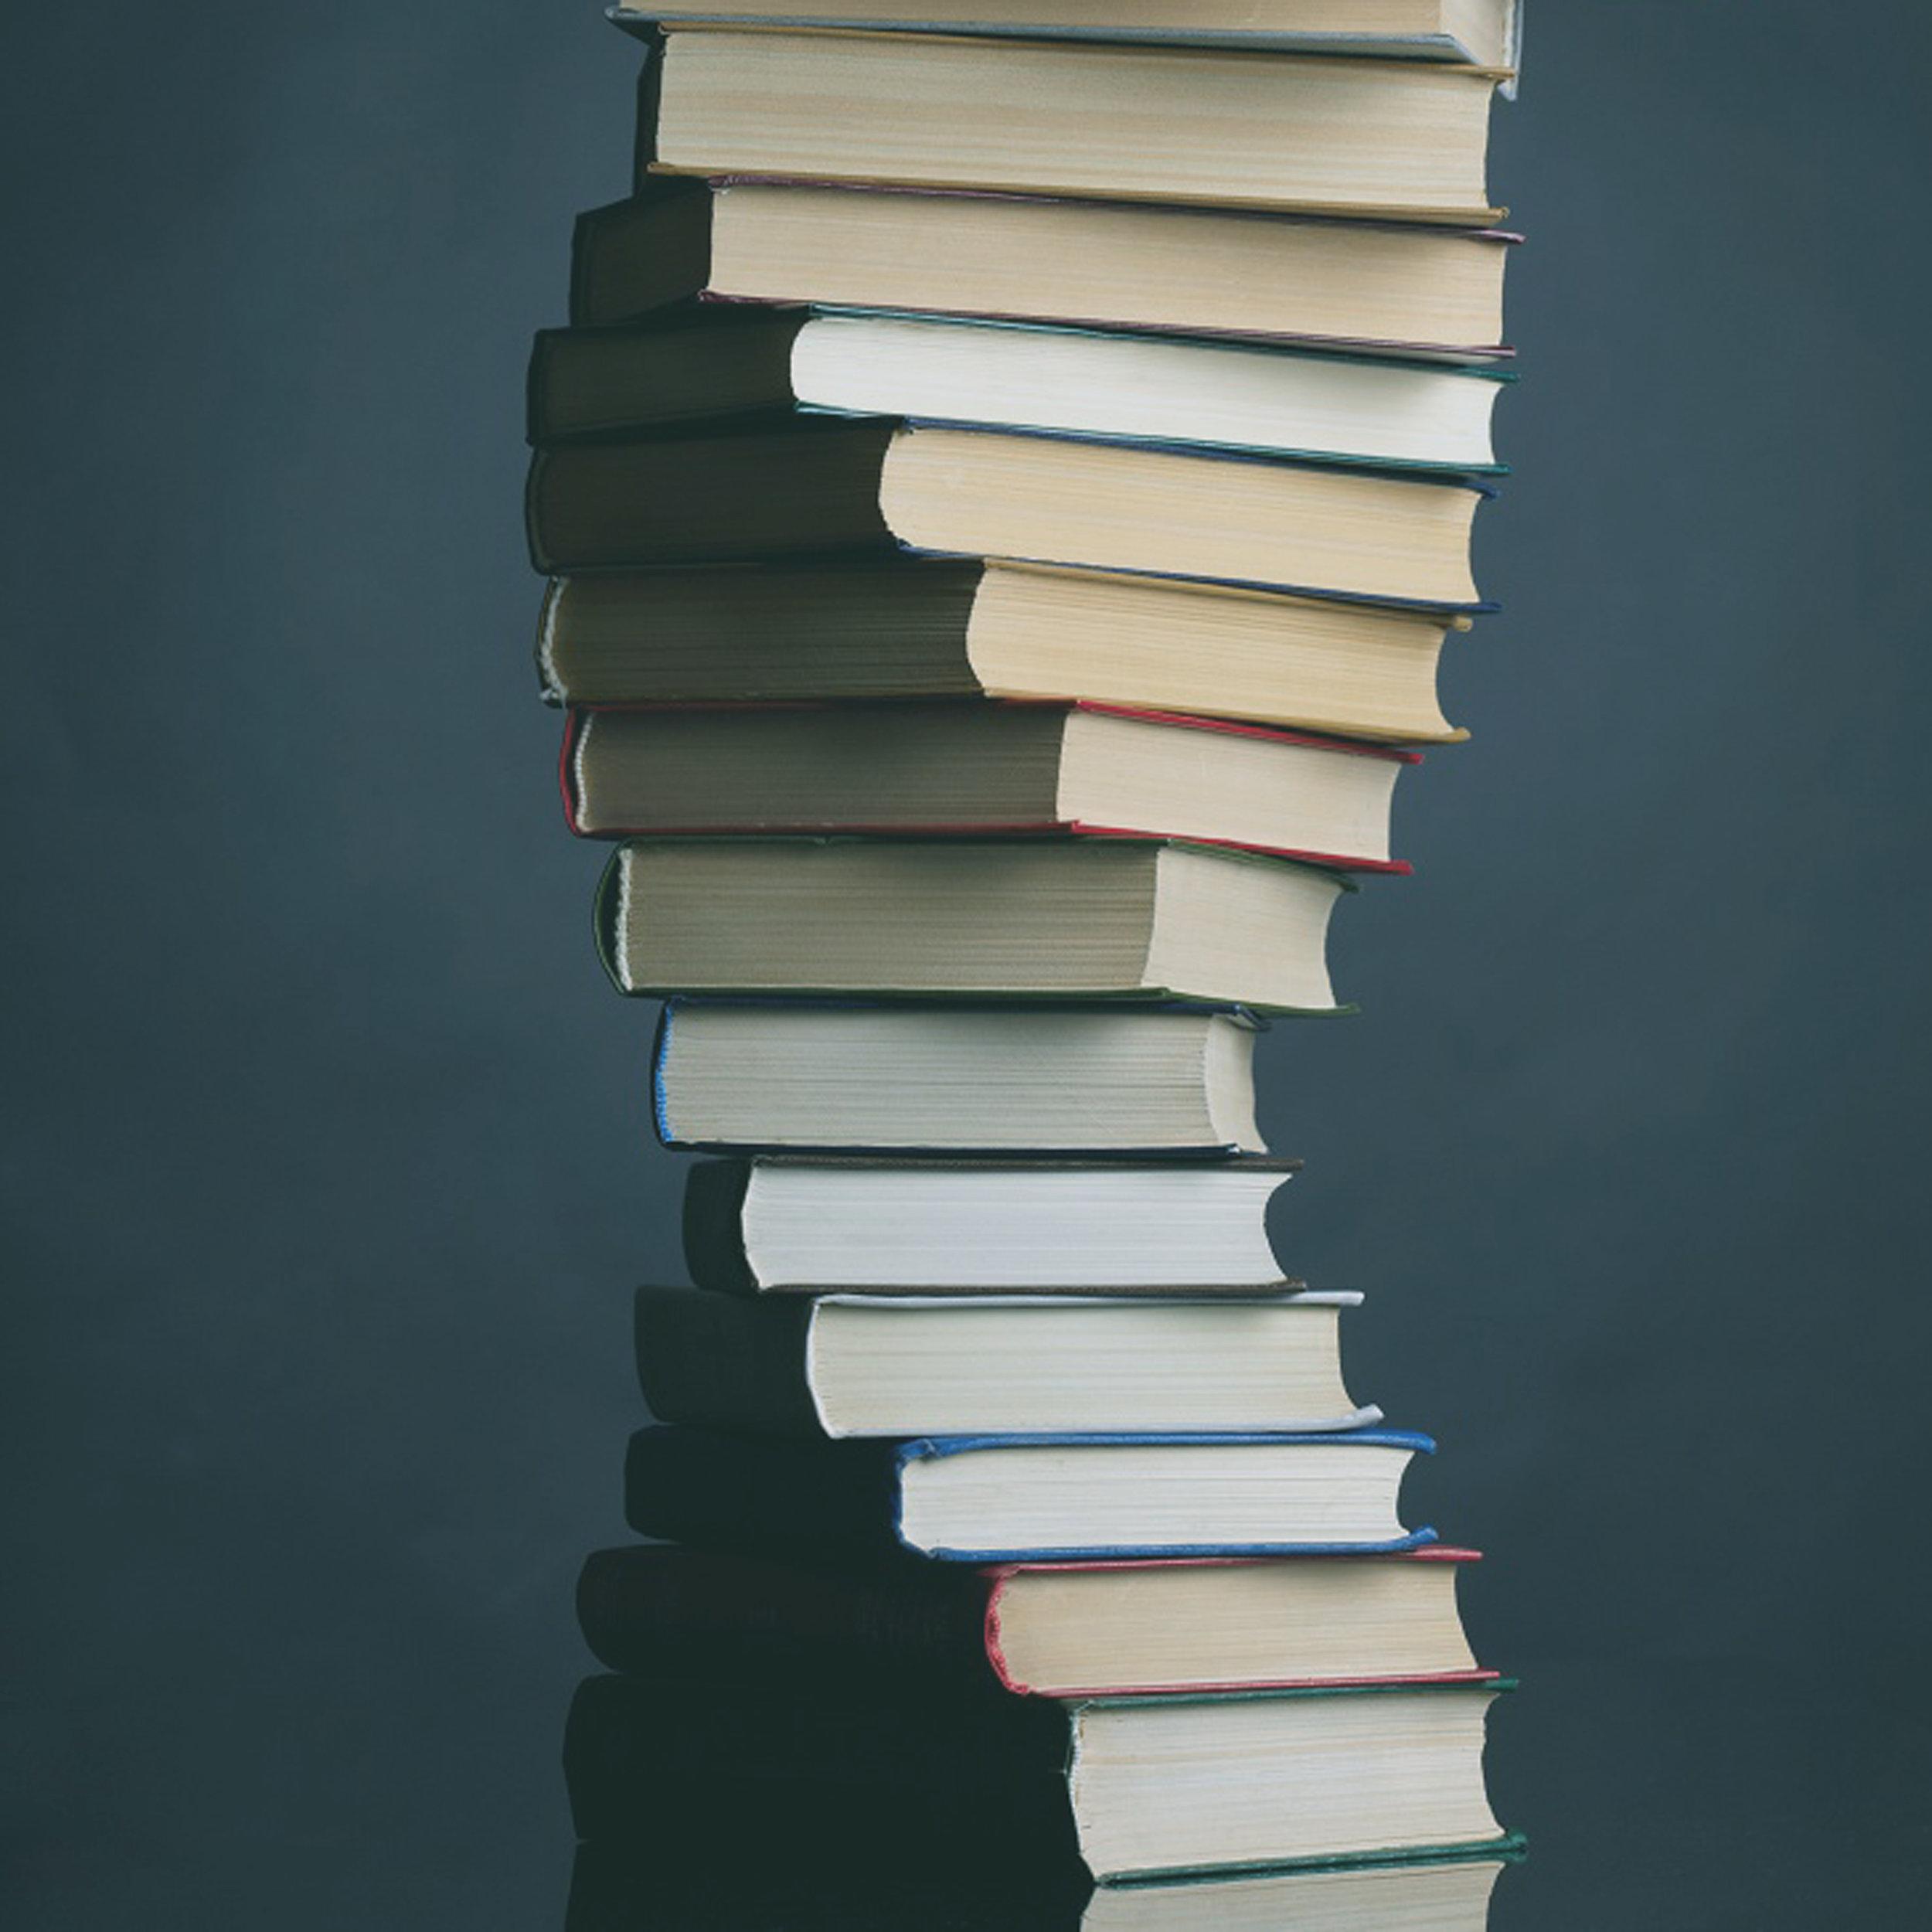 stackable-books-3.jpg